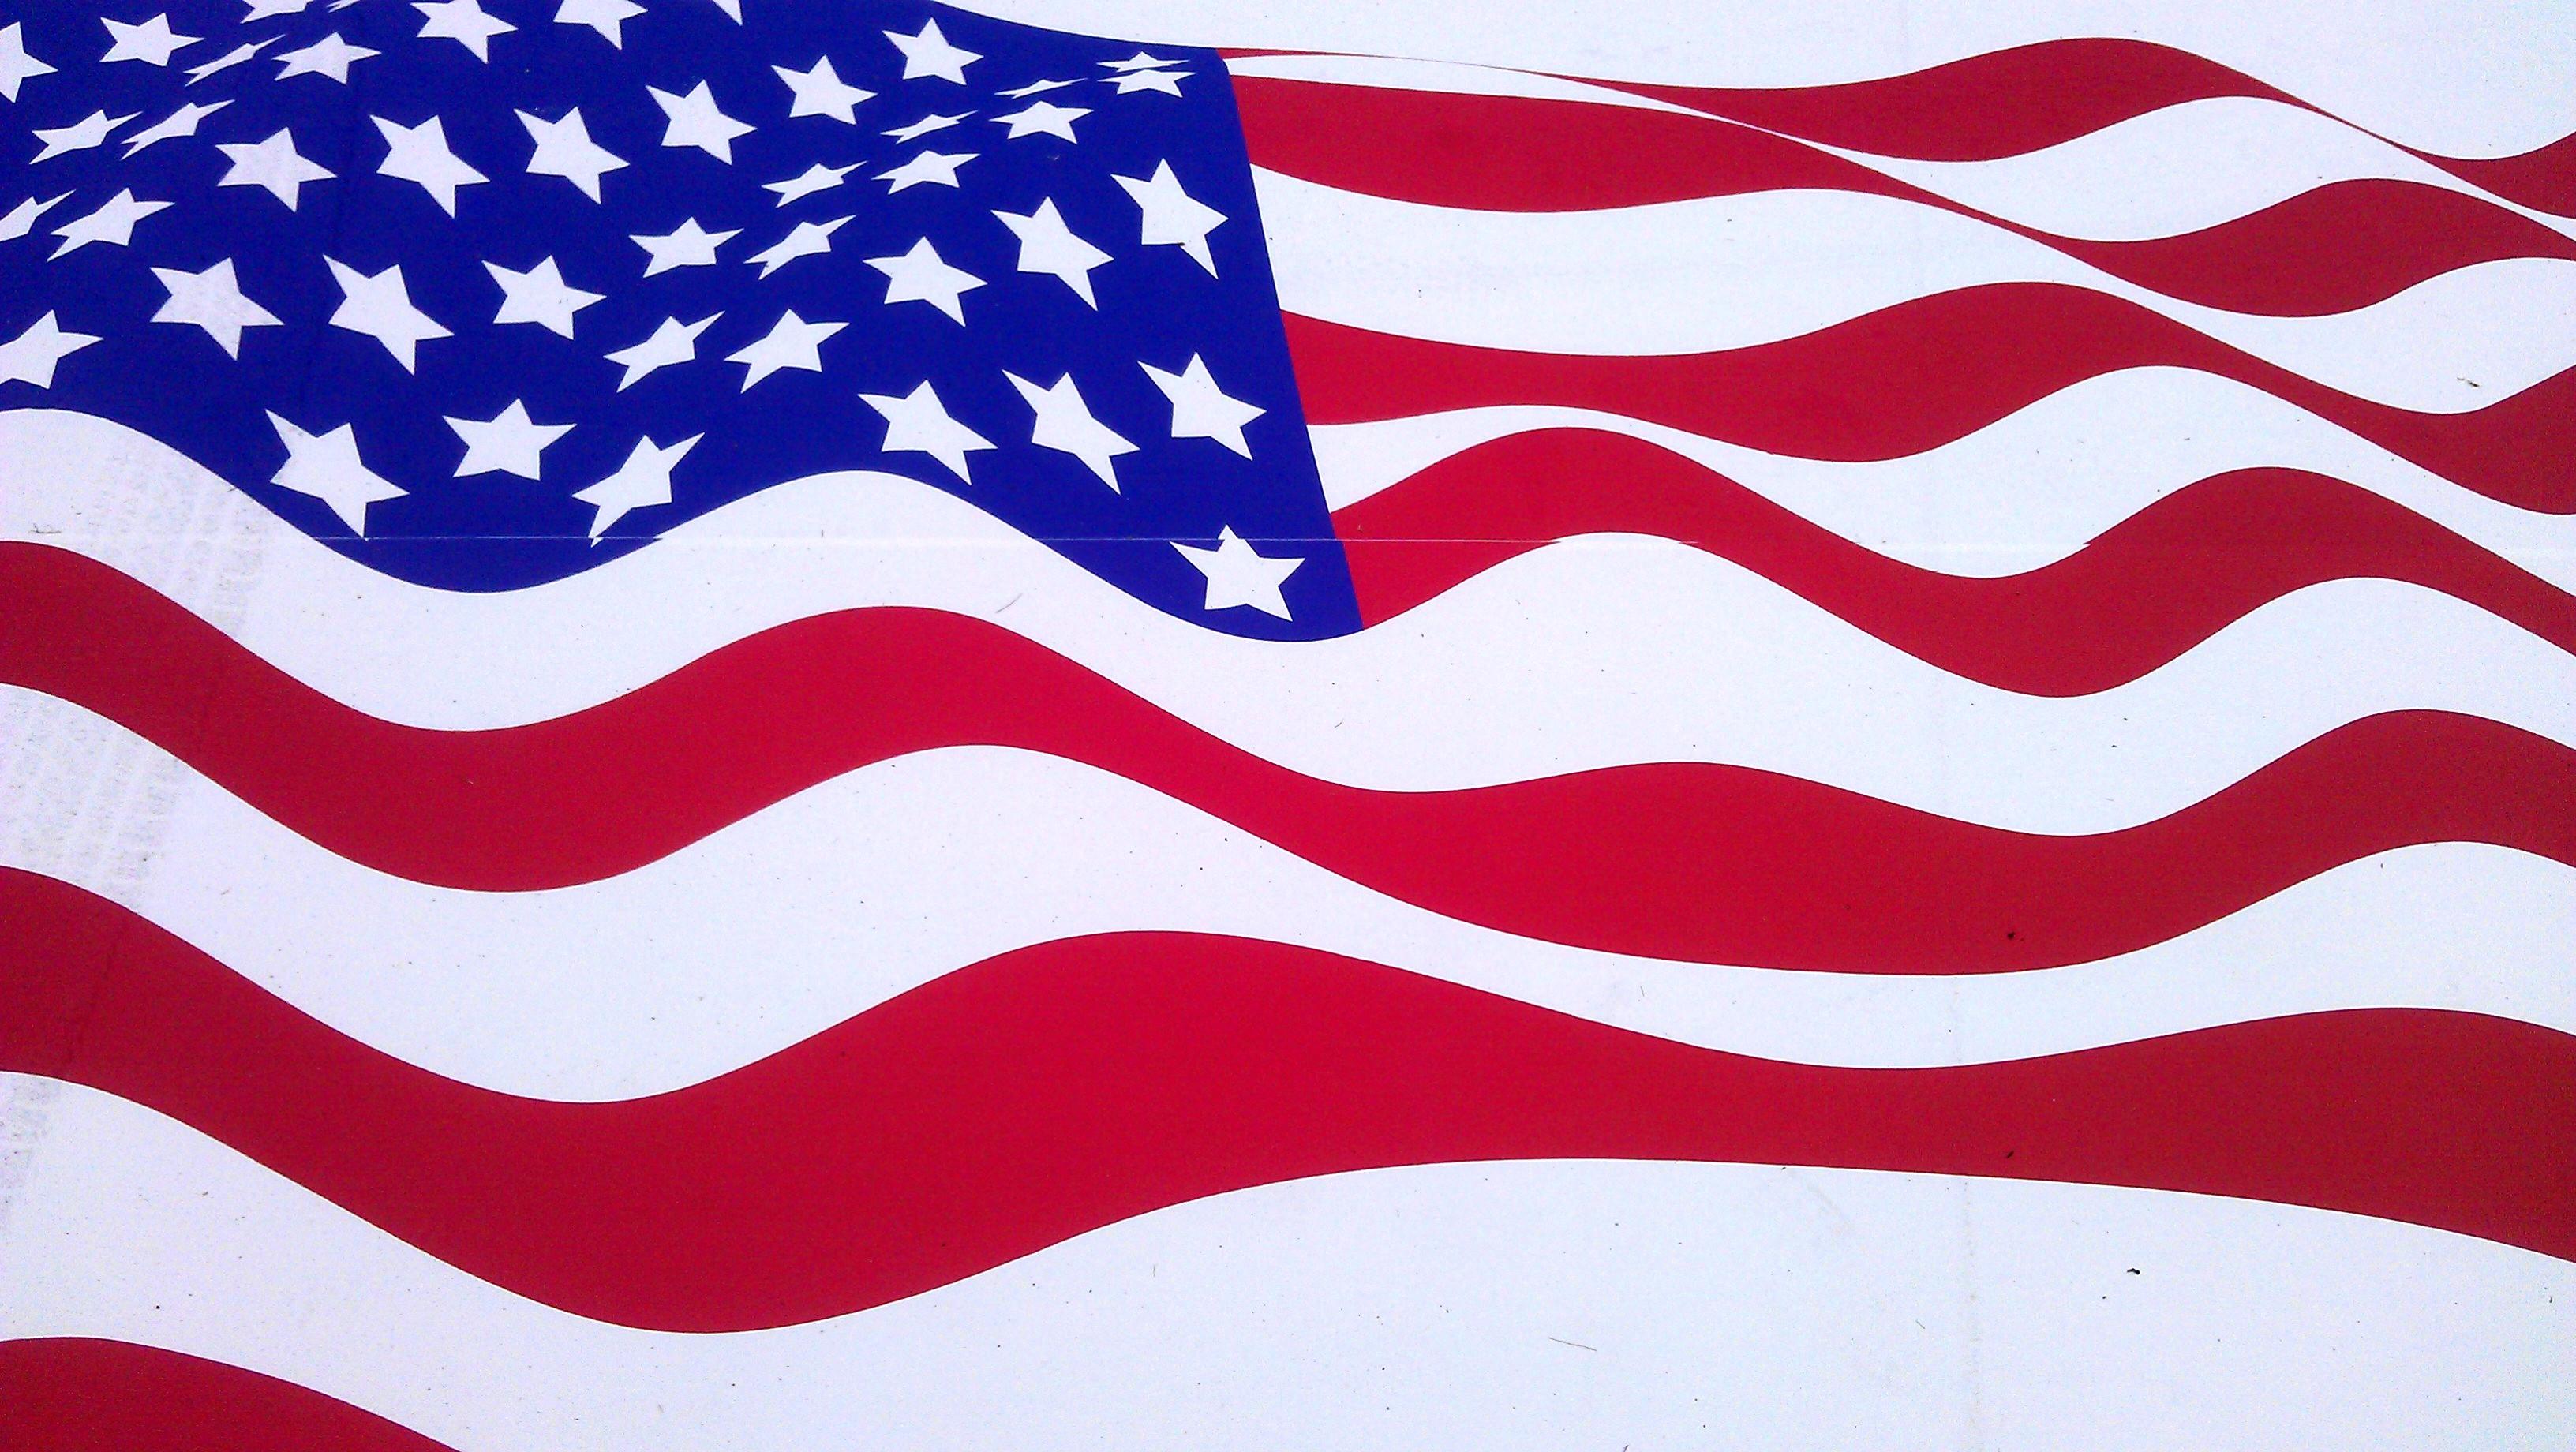 Vertical american flag tumblr nornasfo wallpaper of american flag wallpapersafari vertical american flag tumblr voltagebd Gallery